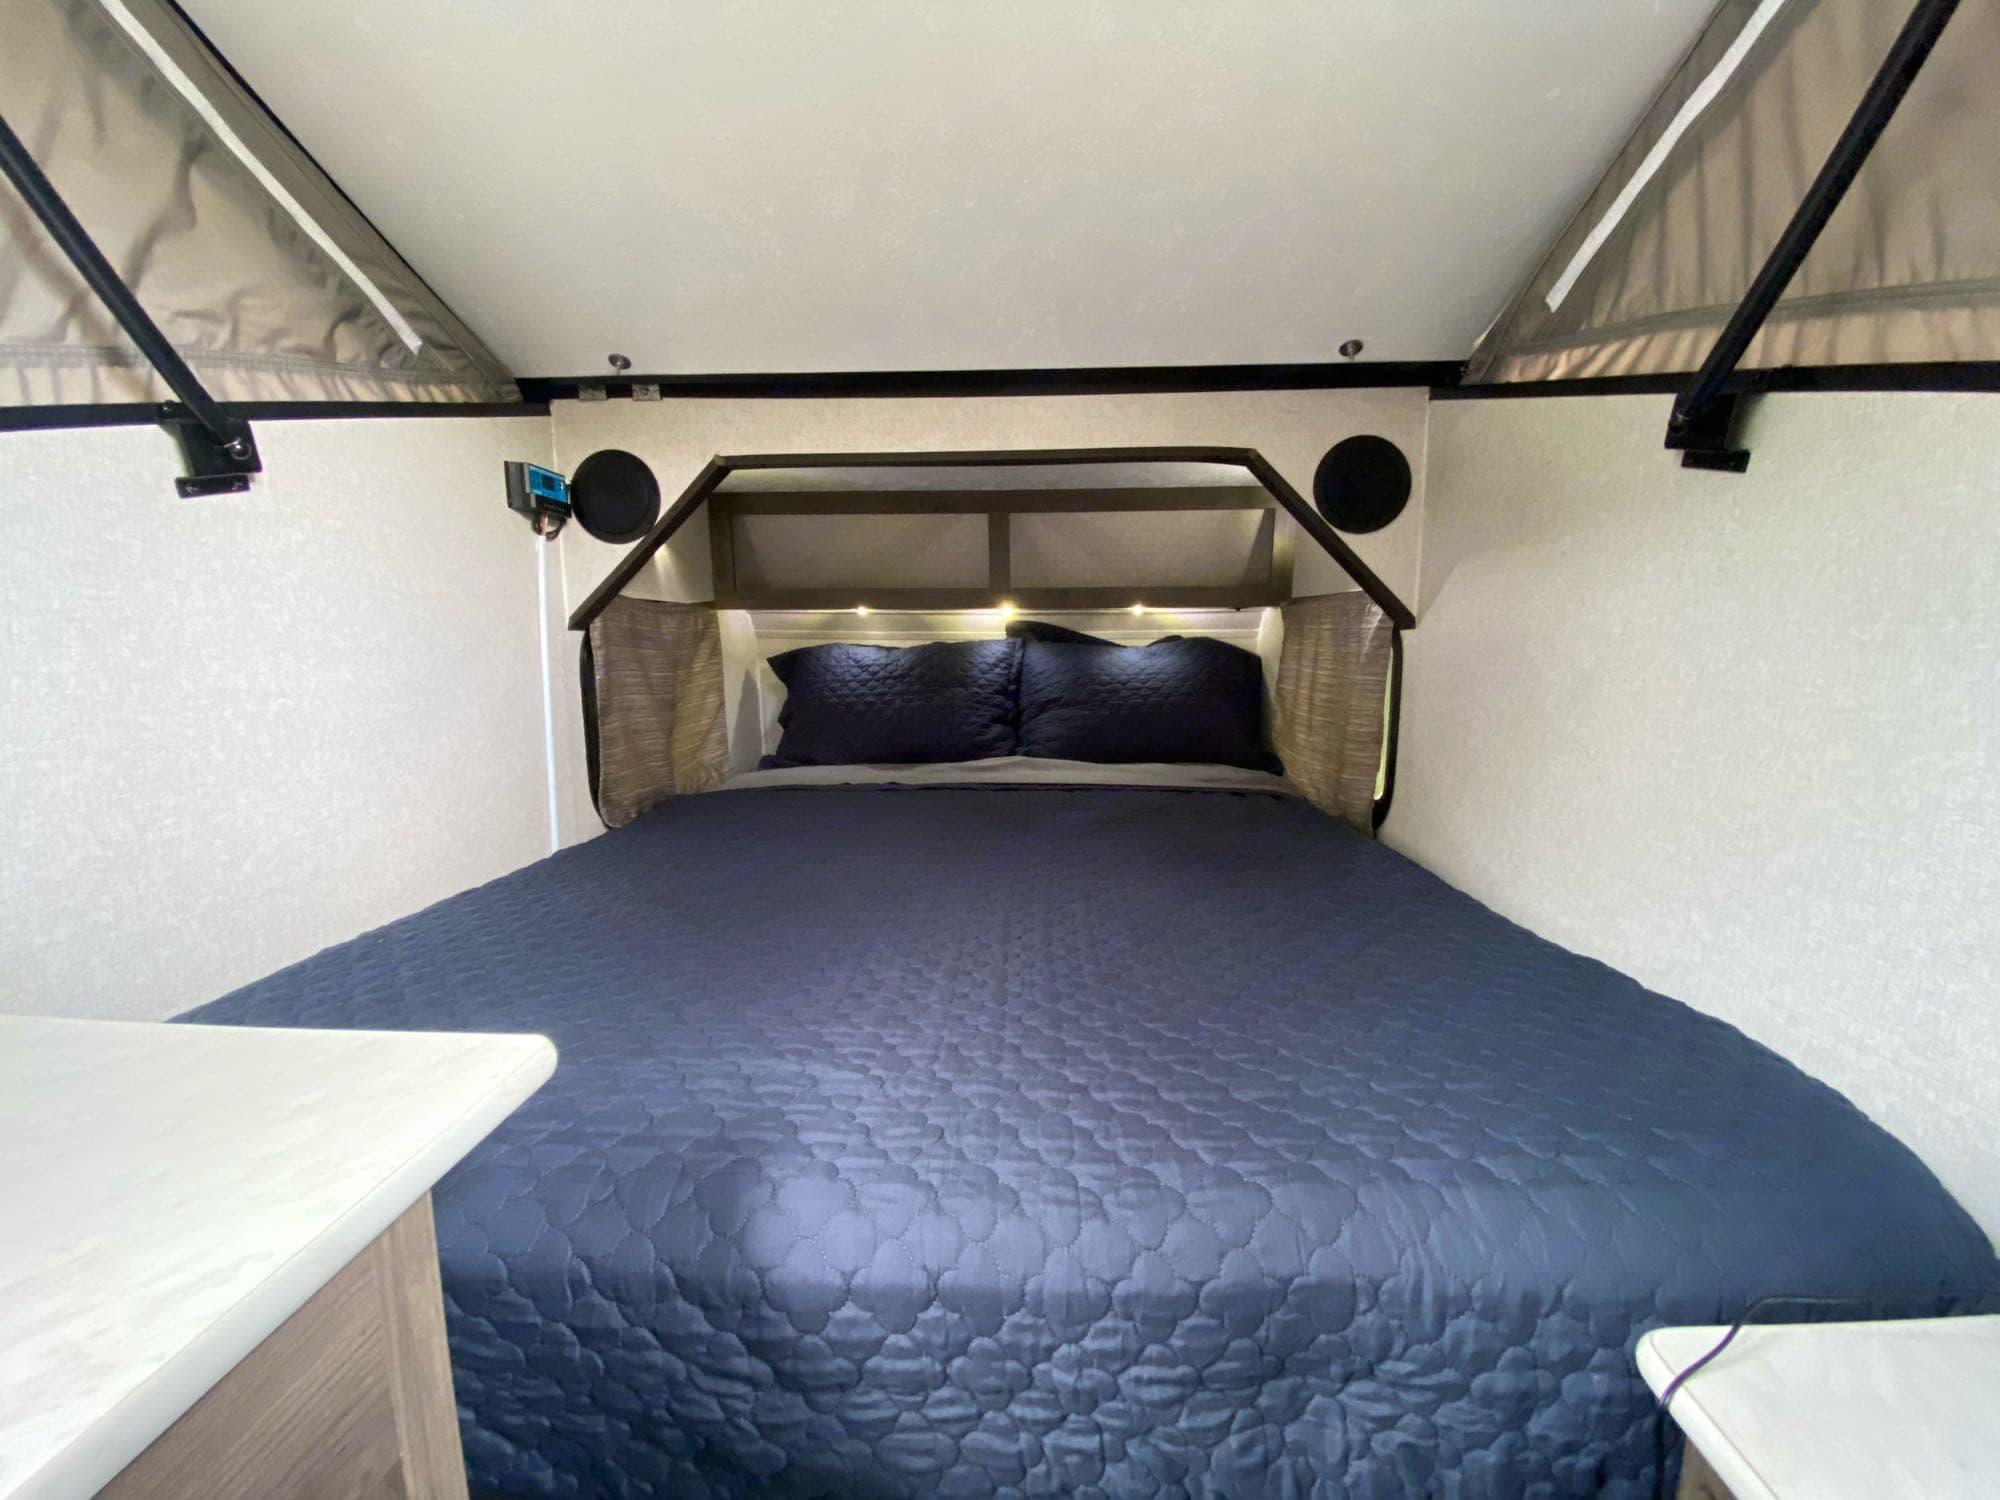 KING has a full sized hybrid memory foam/spring mattress. Viking Express 9.0TD 2020